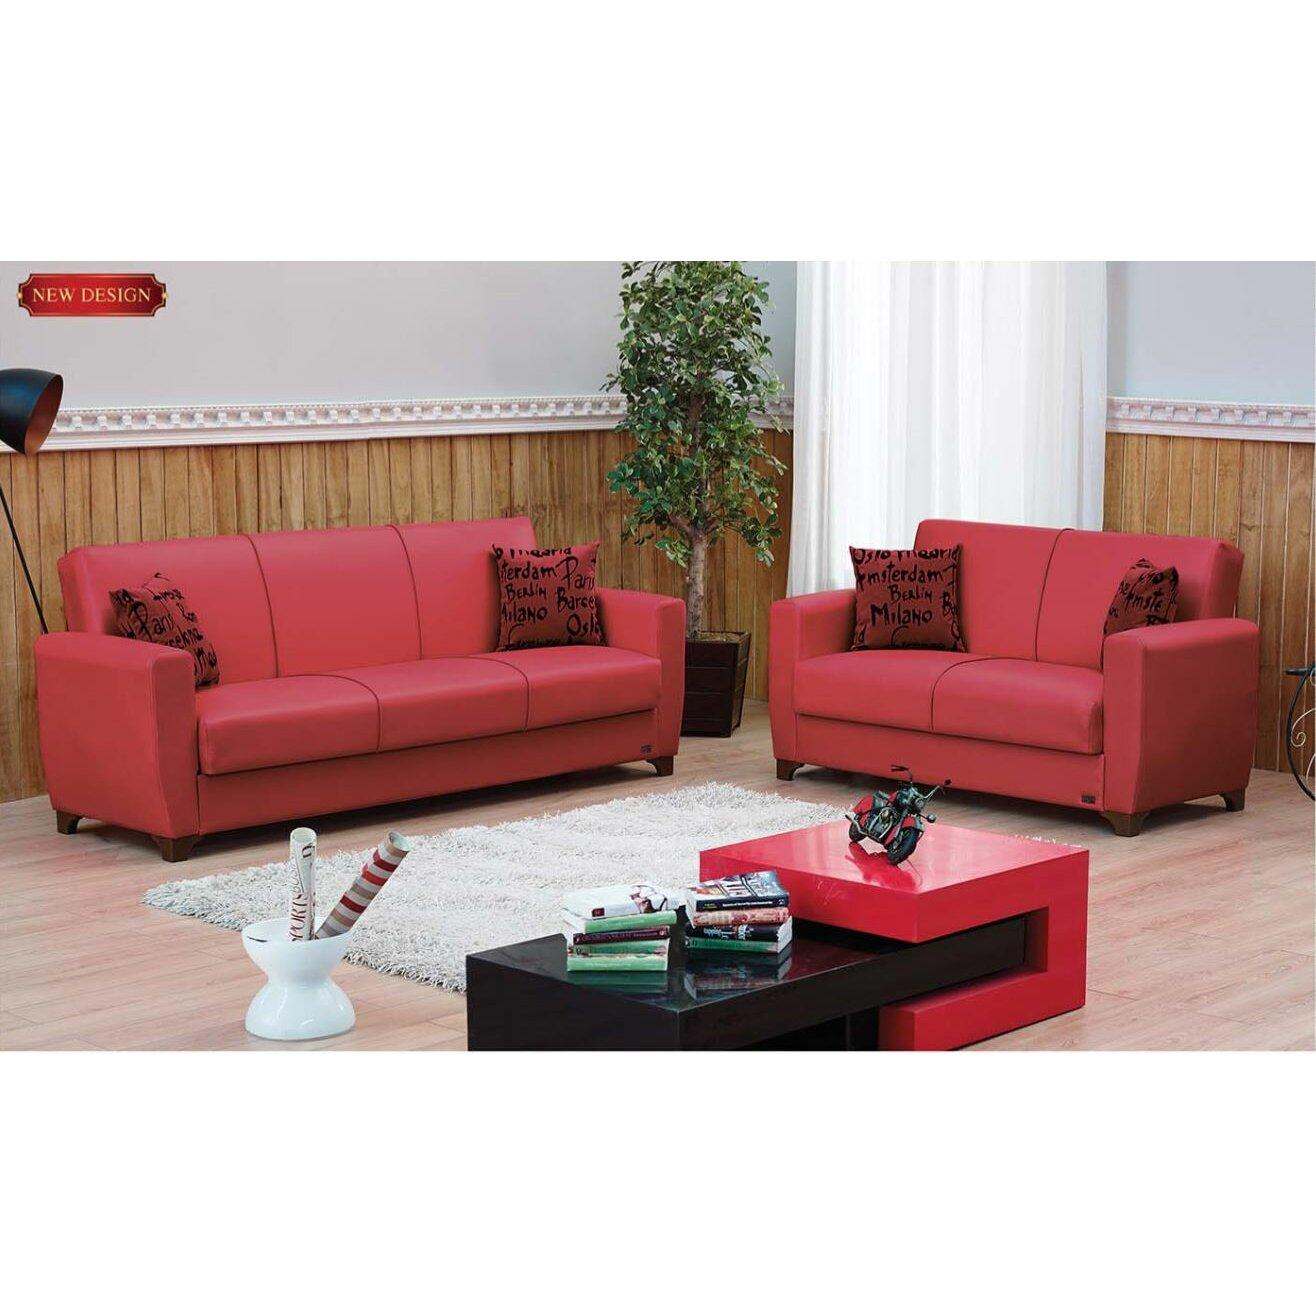 Sleeper Sofa Dallas Refil Sofa : Beyan Signature Dallas Sleeper Sofa from forexrefiller.com size 1316 x 1316 jpeg 248kB